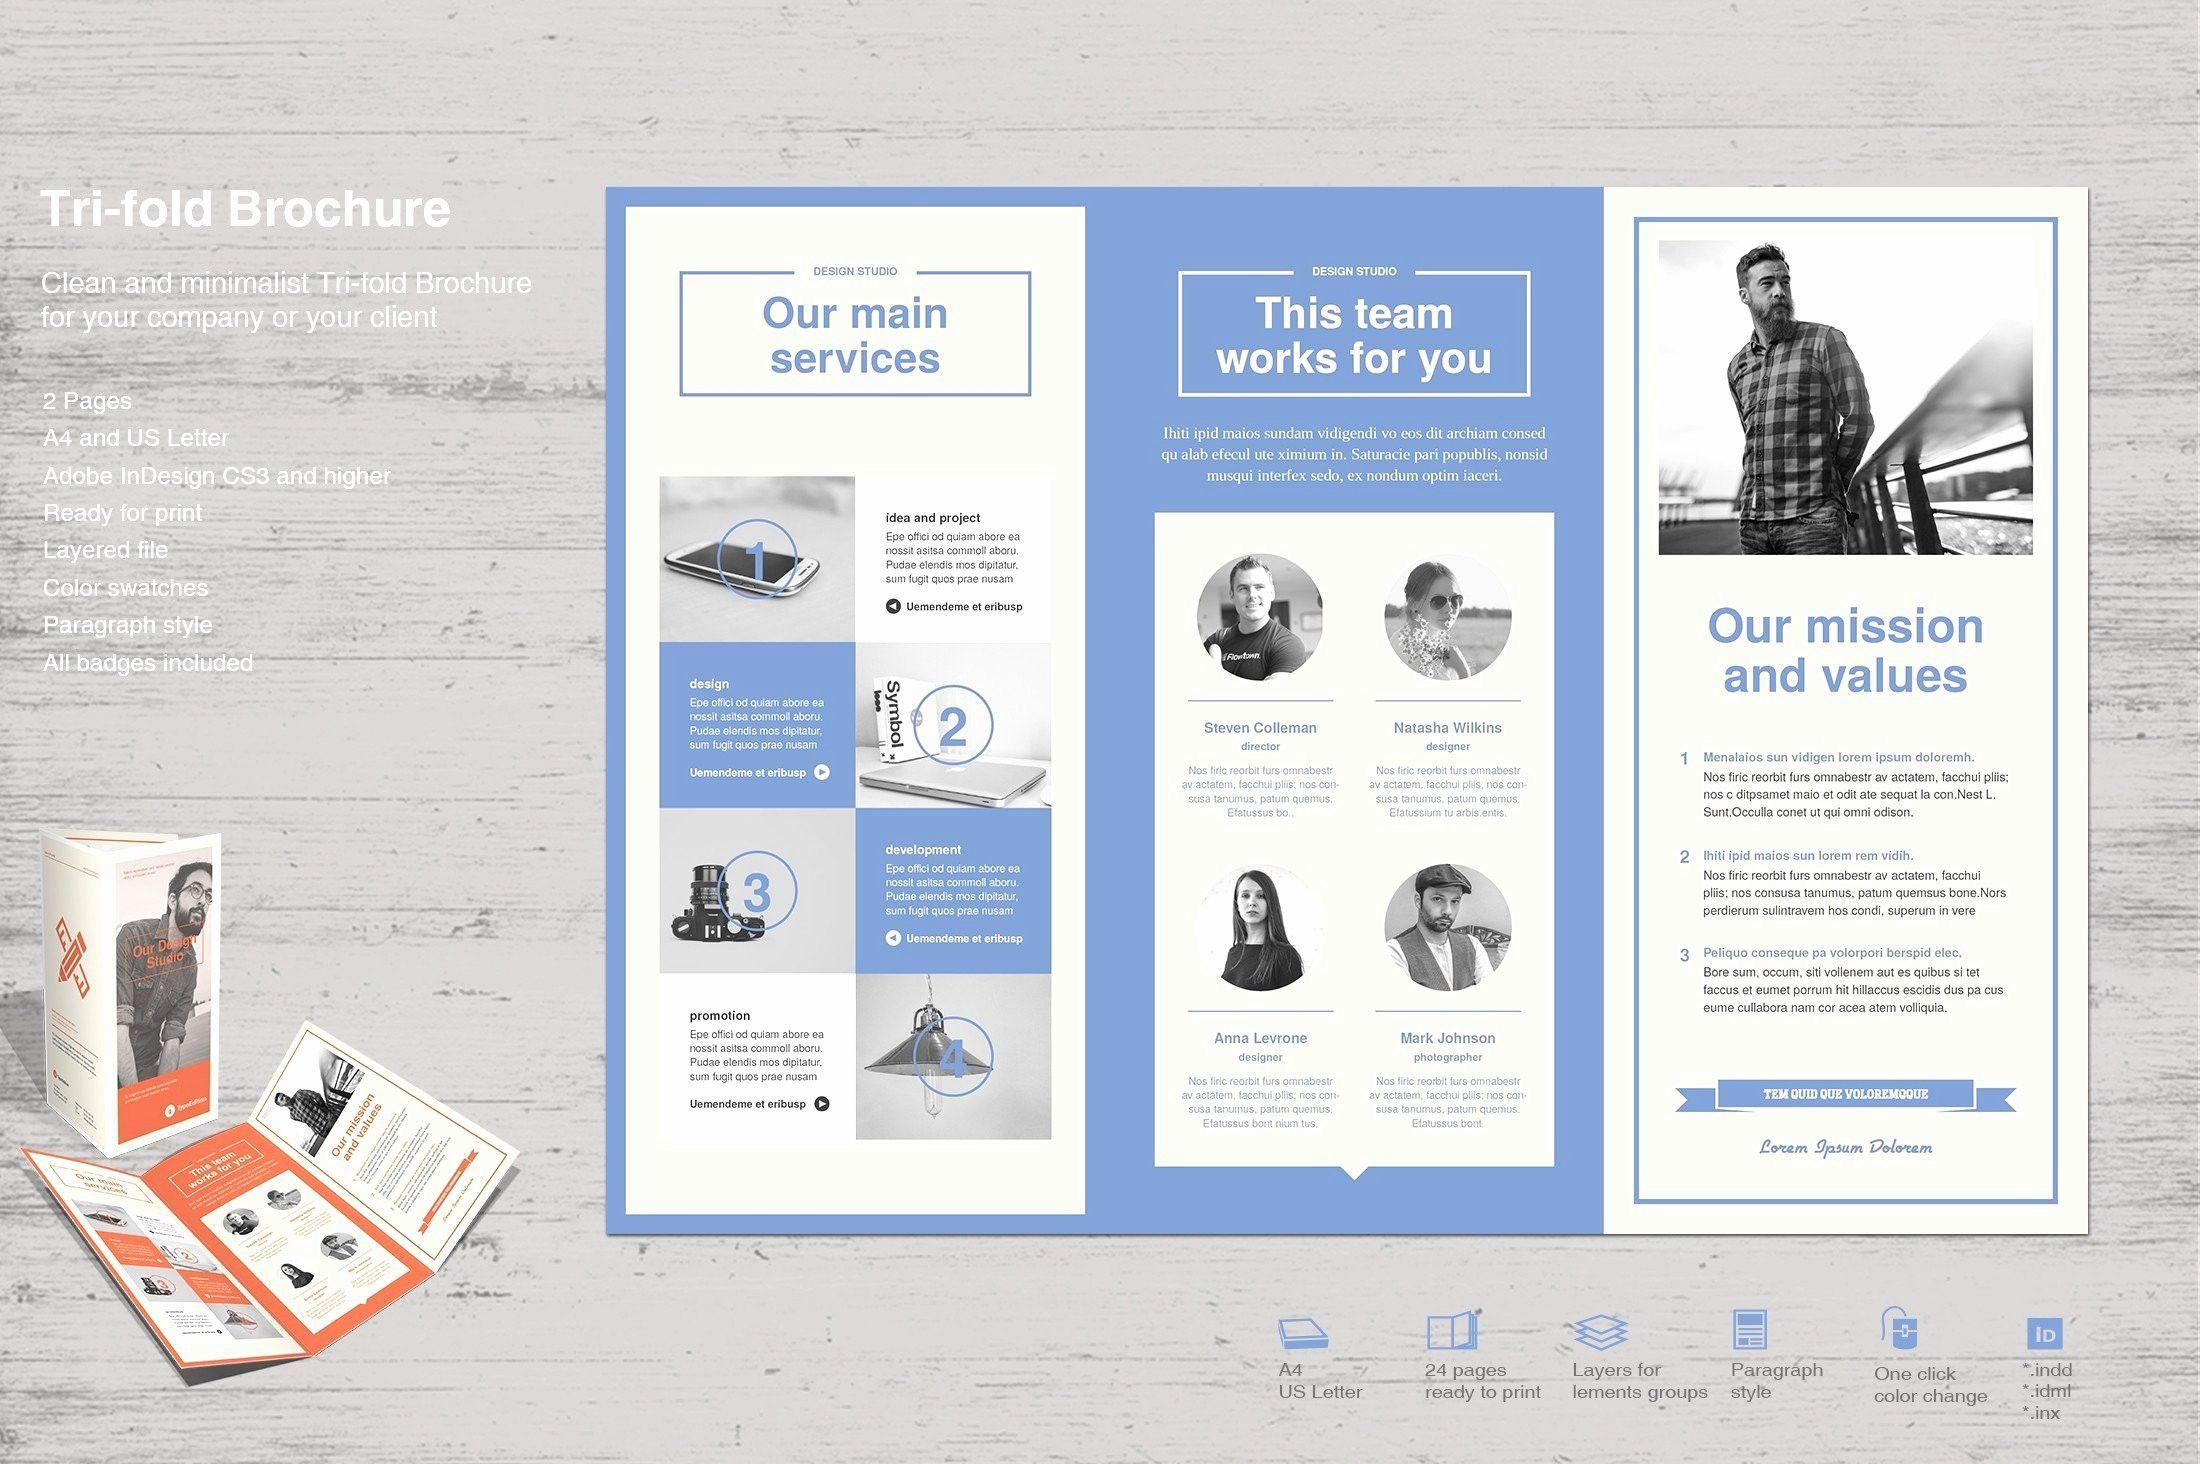 Tri Fold Brochure Template Powerpoint Fresh Architect Powerpoint Template Sample Ho In 2020 Brochure Design Template Free Brochure Template Trifold Brochure Template